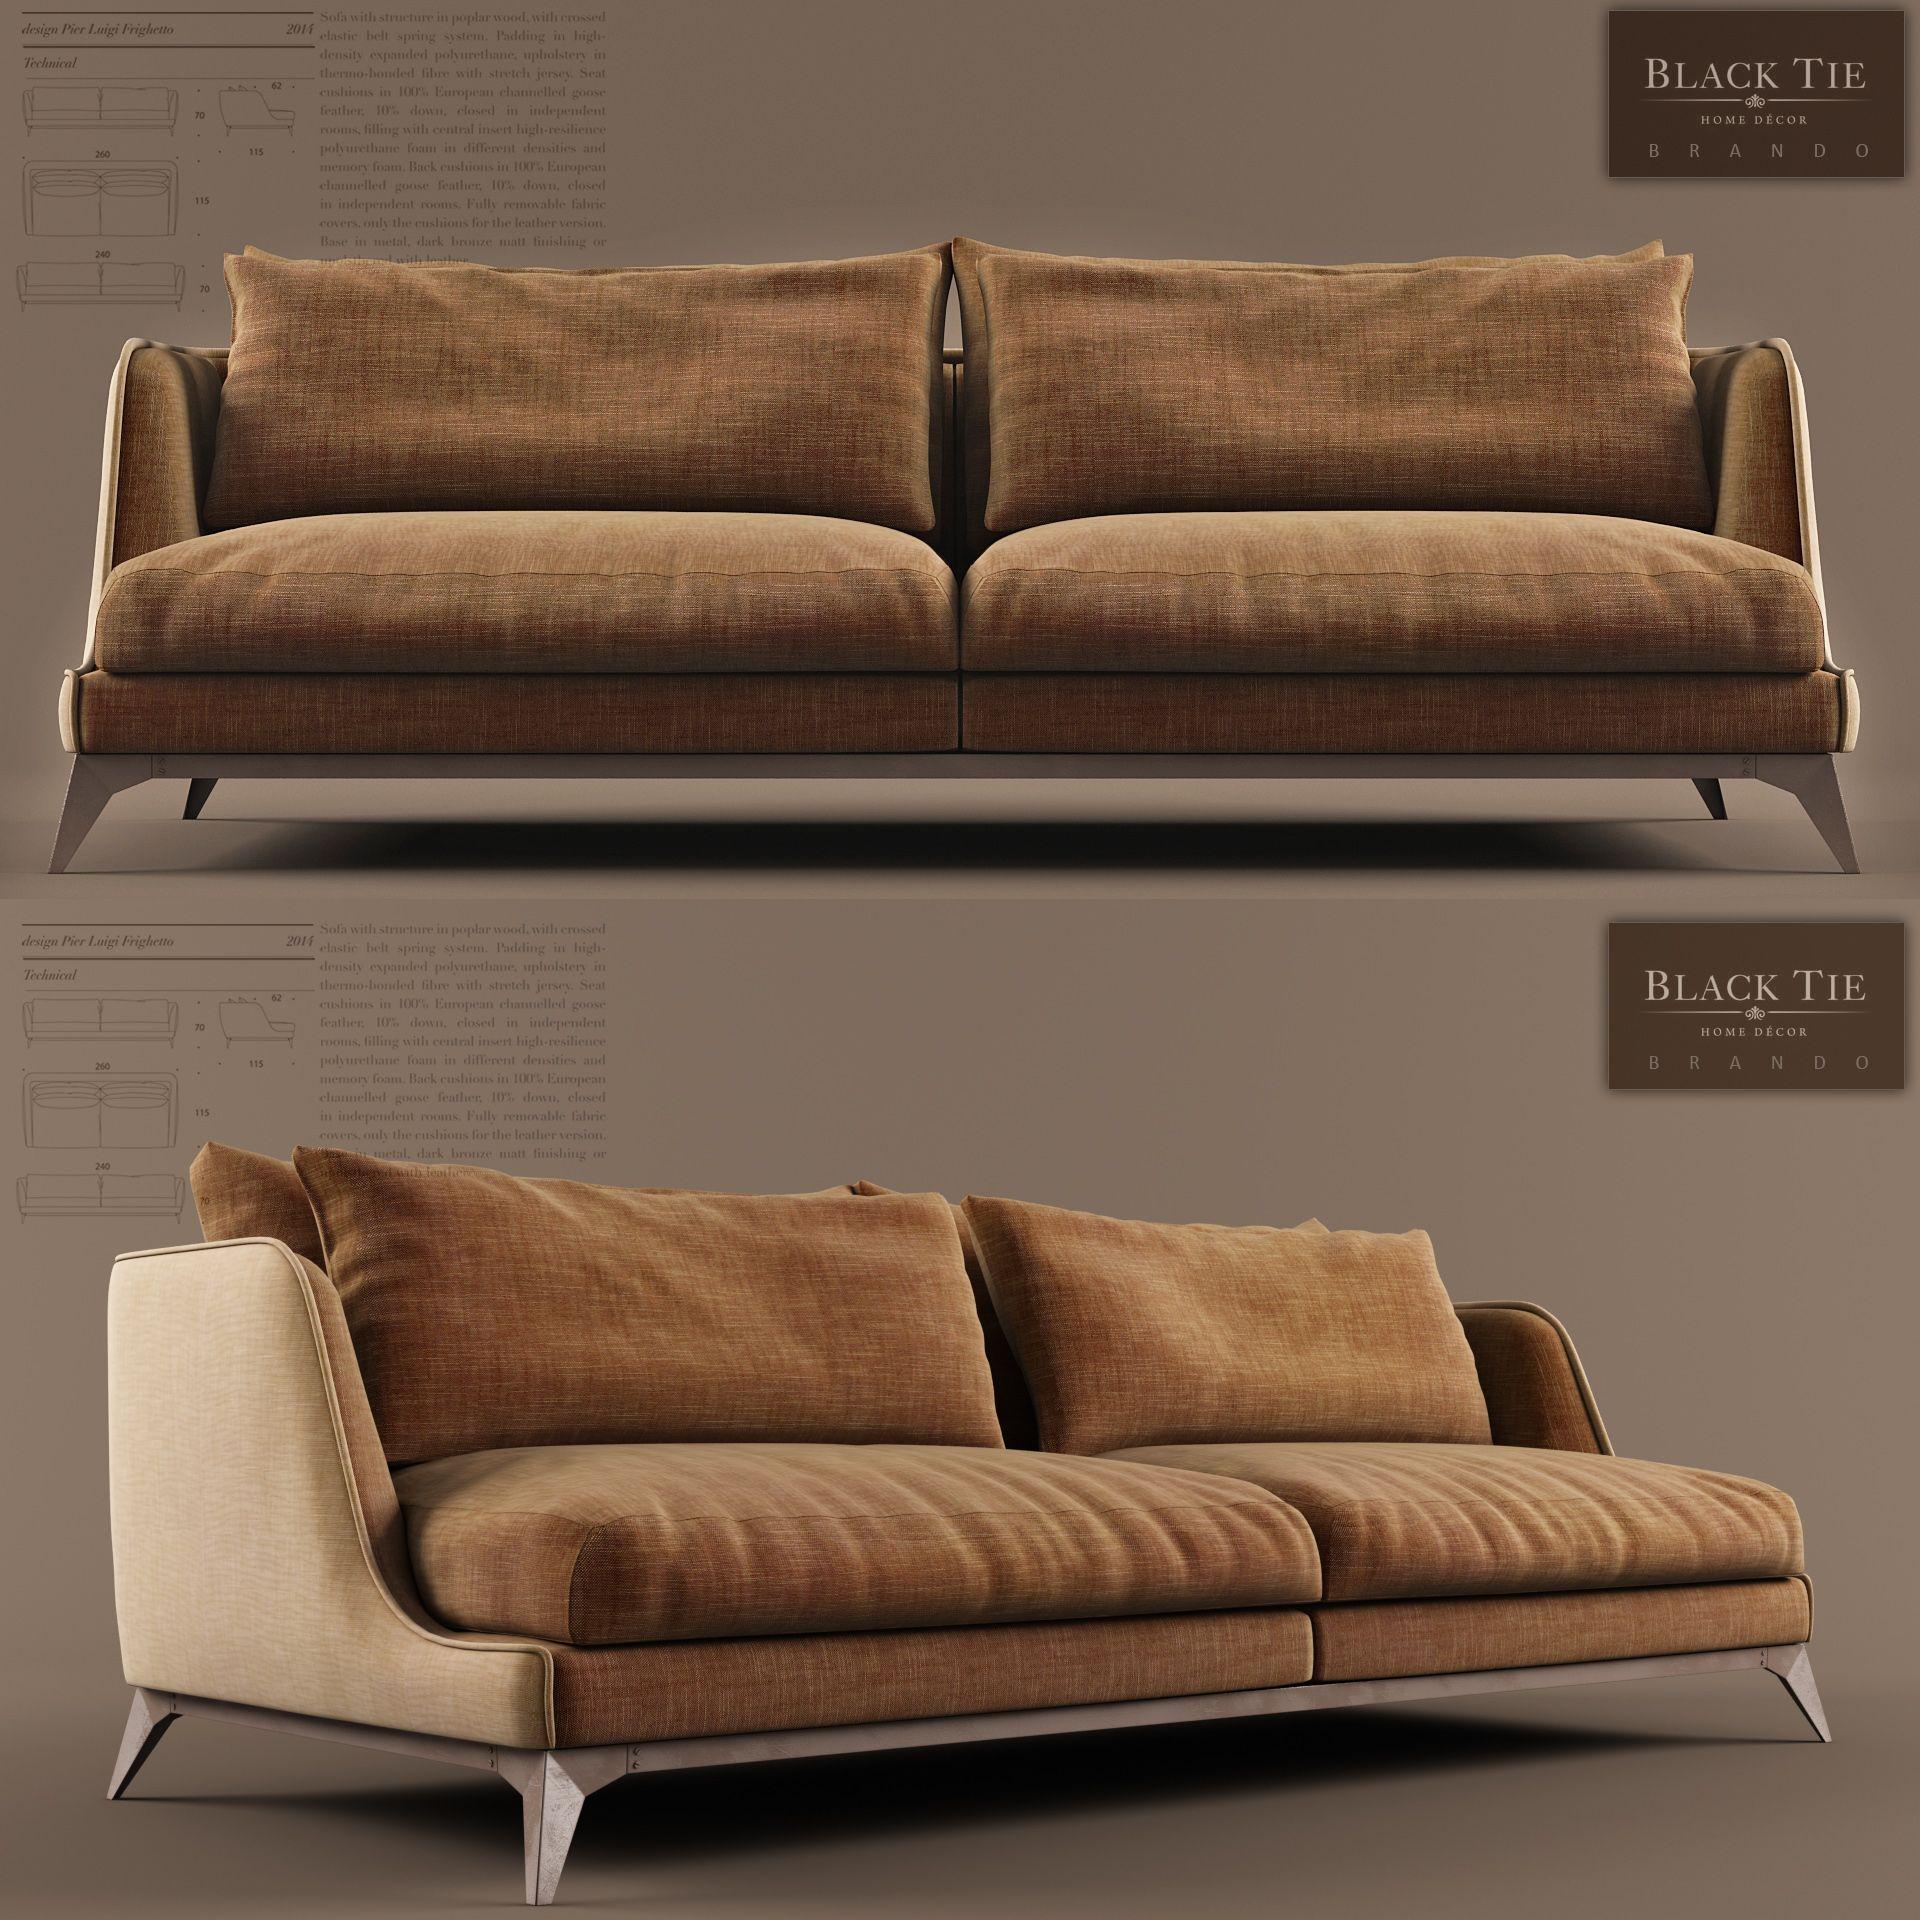 Design By Pier Luigi Frighetto Sofa With Structure In Poplar Wood